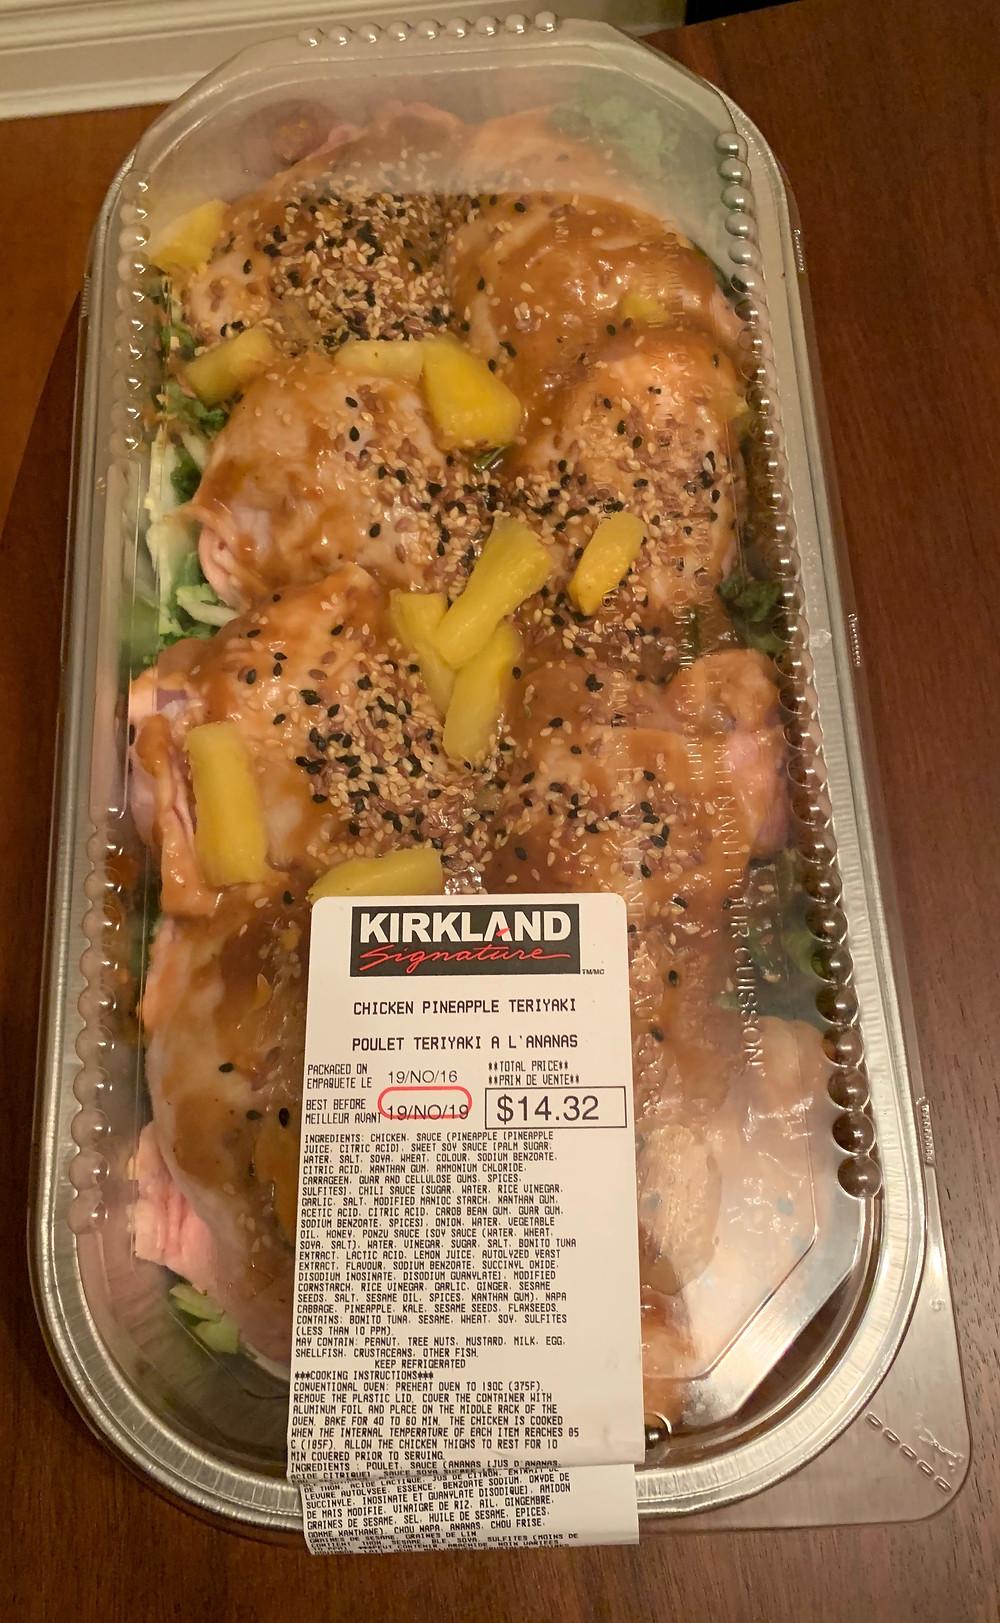 Costco Kirkland Signature Chicken Pineapple Teriyaki